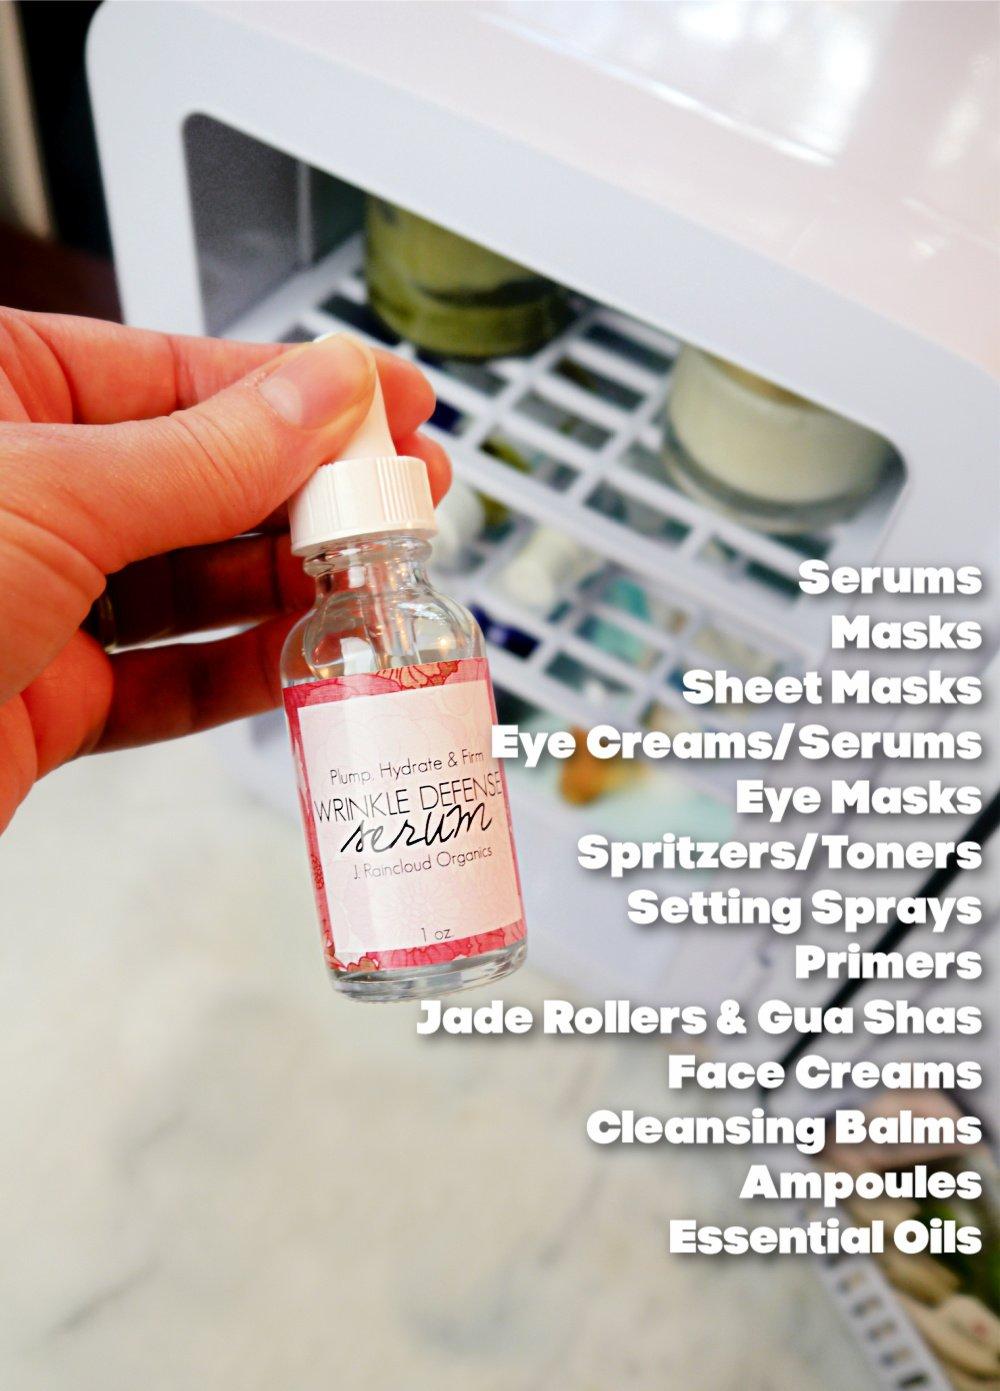 Benefits of a Skin Care Fridge